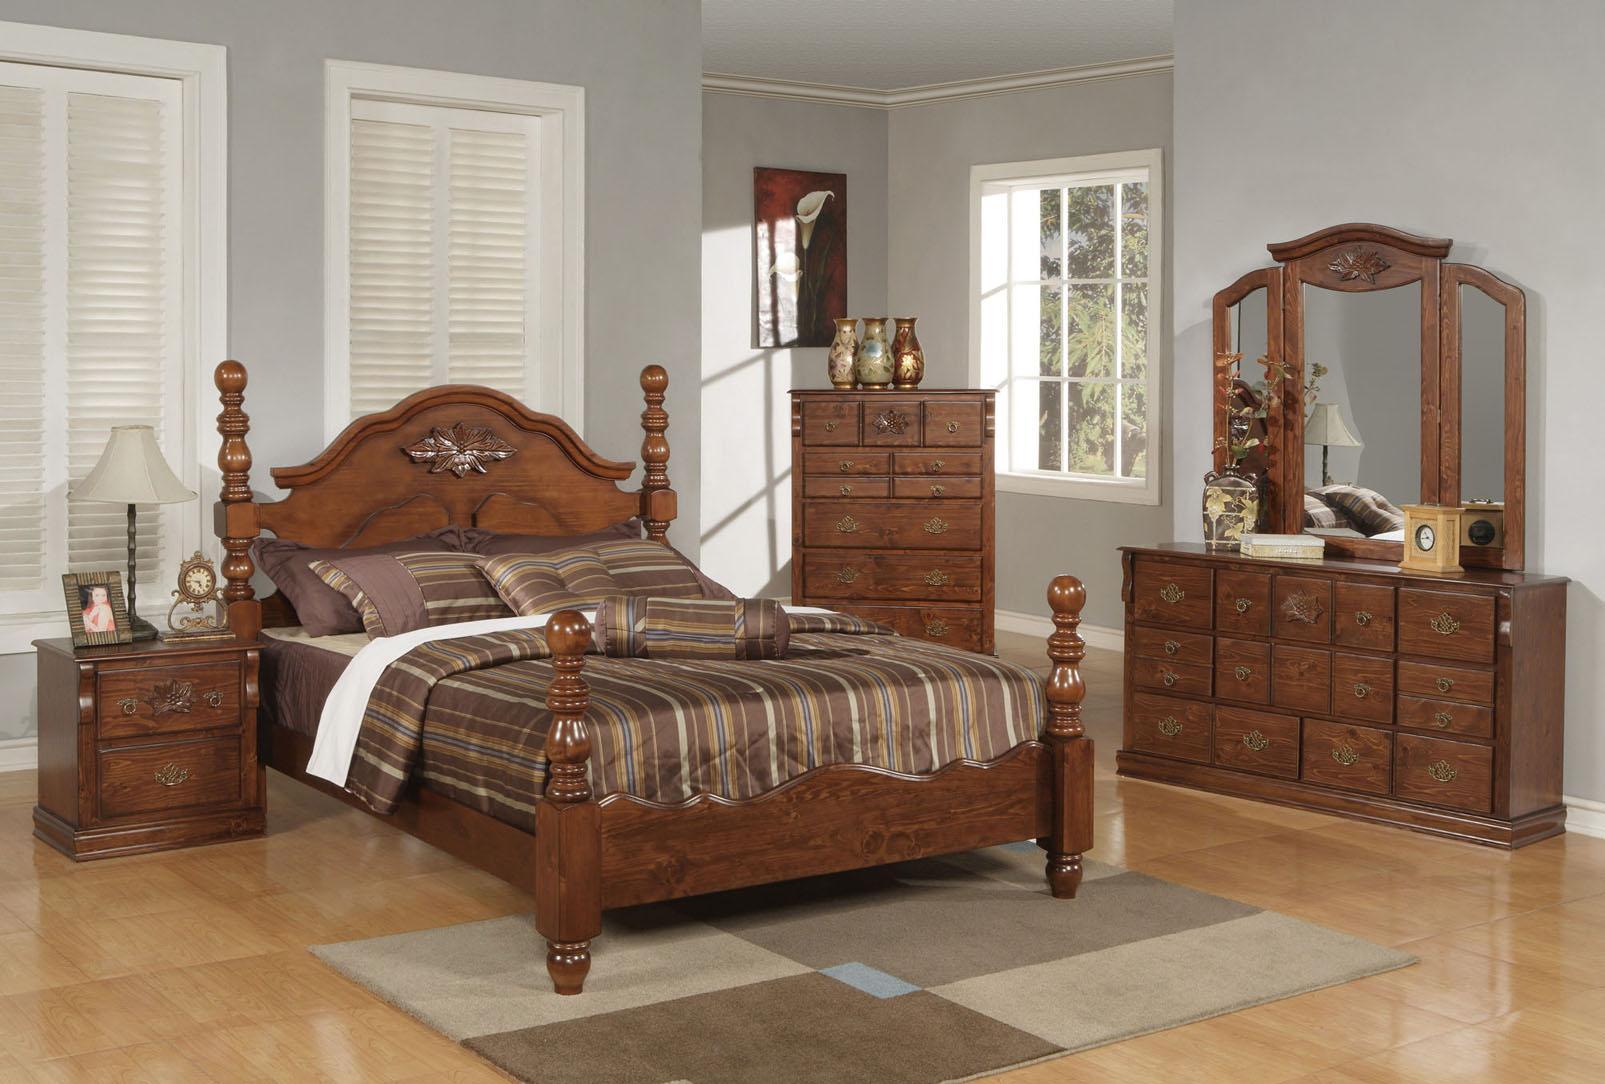 Acme Furniture Ponderosa Queen Bedroom Group - Item Number: 01712 Q Bedrom Group